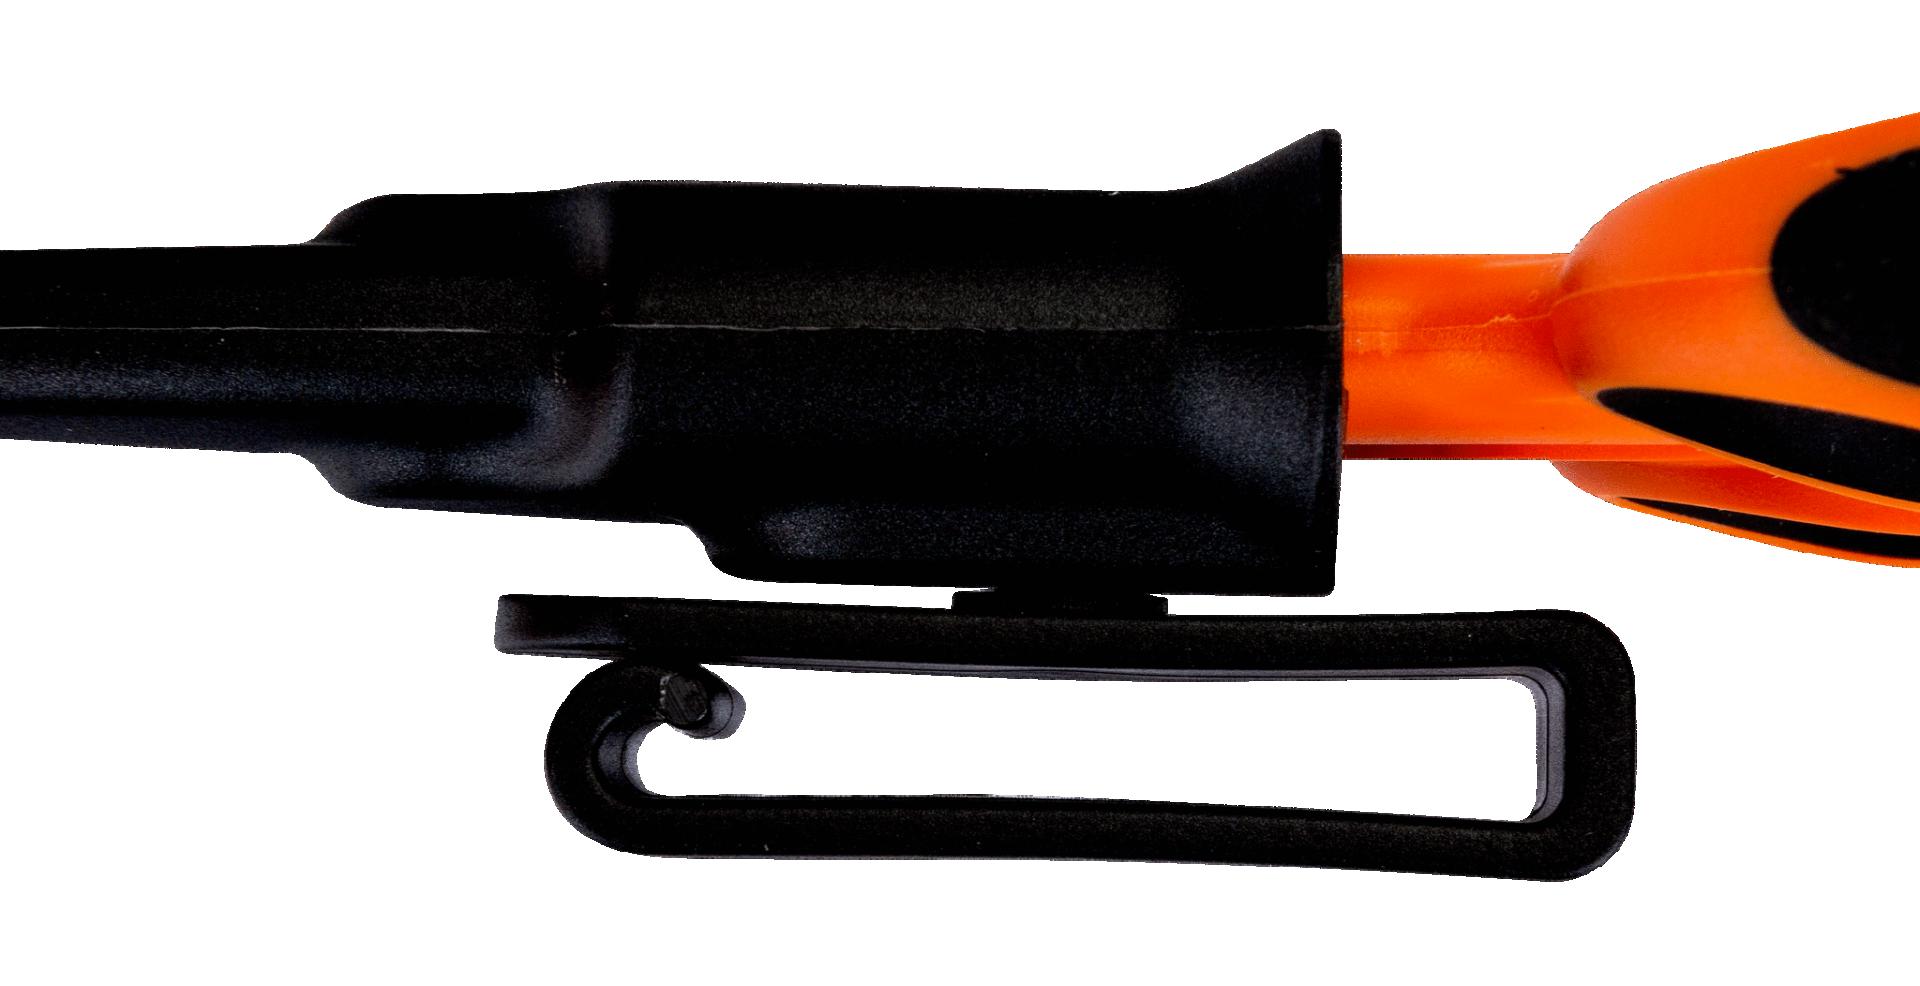 Nożyce dla elektryka 140 mm BAHCO (nr kat. SCB140)